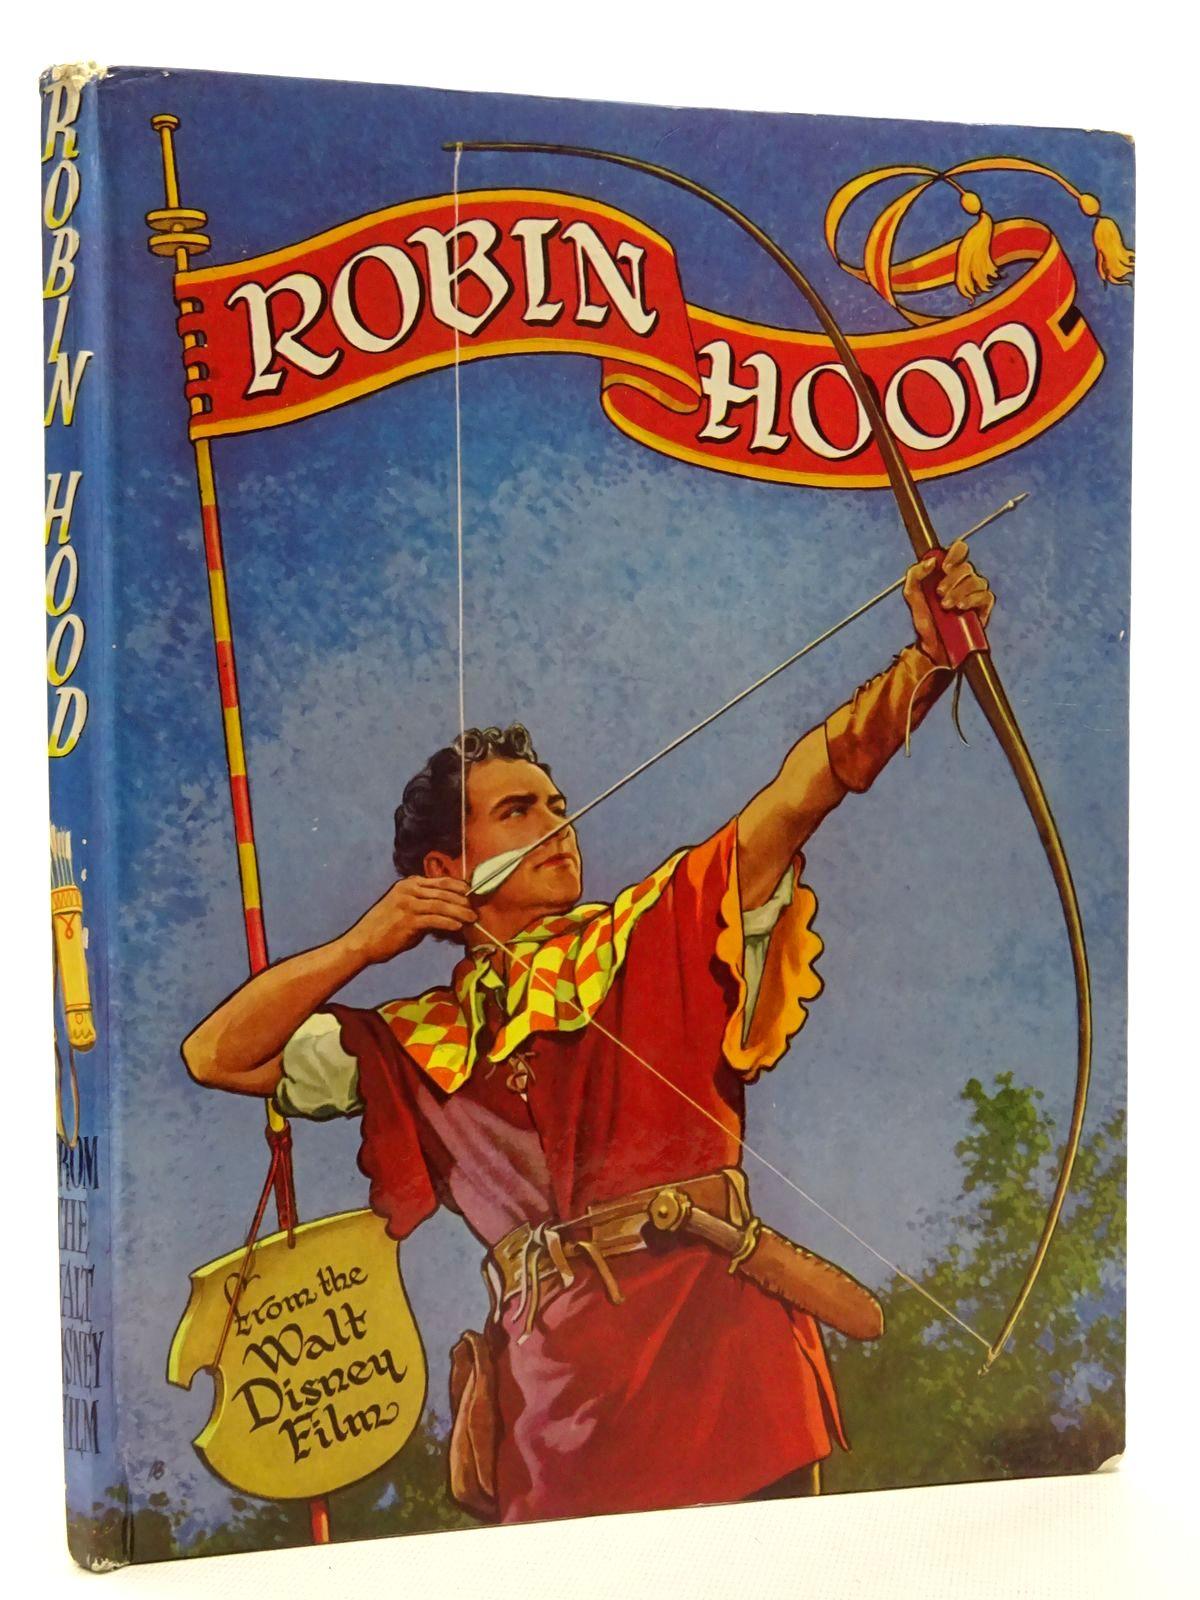 Photo of WALT DISNEY'S ROBIN HOOD written by Disney, Walt published by L.T.A. Robinson Ltd. (STOCK CODE: 2125277)  for sale by Stella & Rose's Books